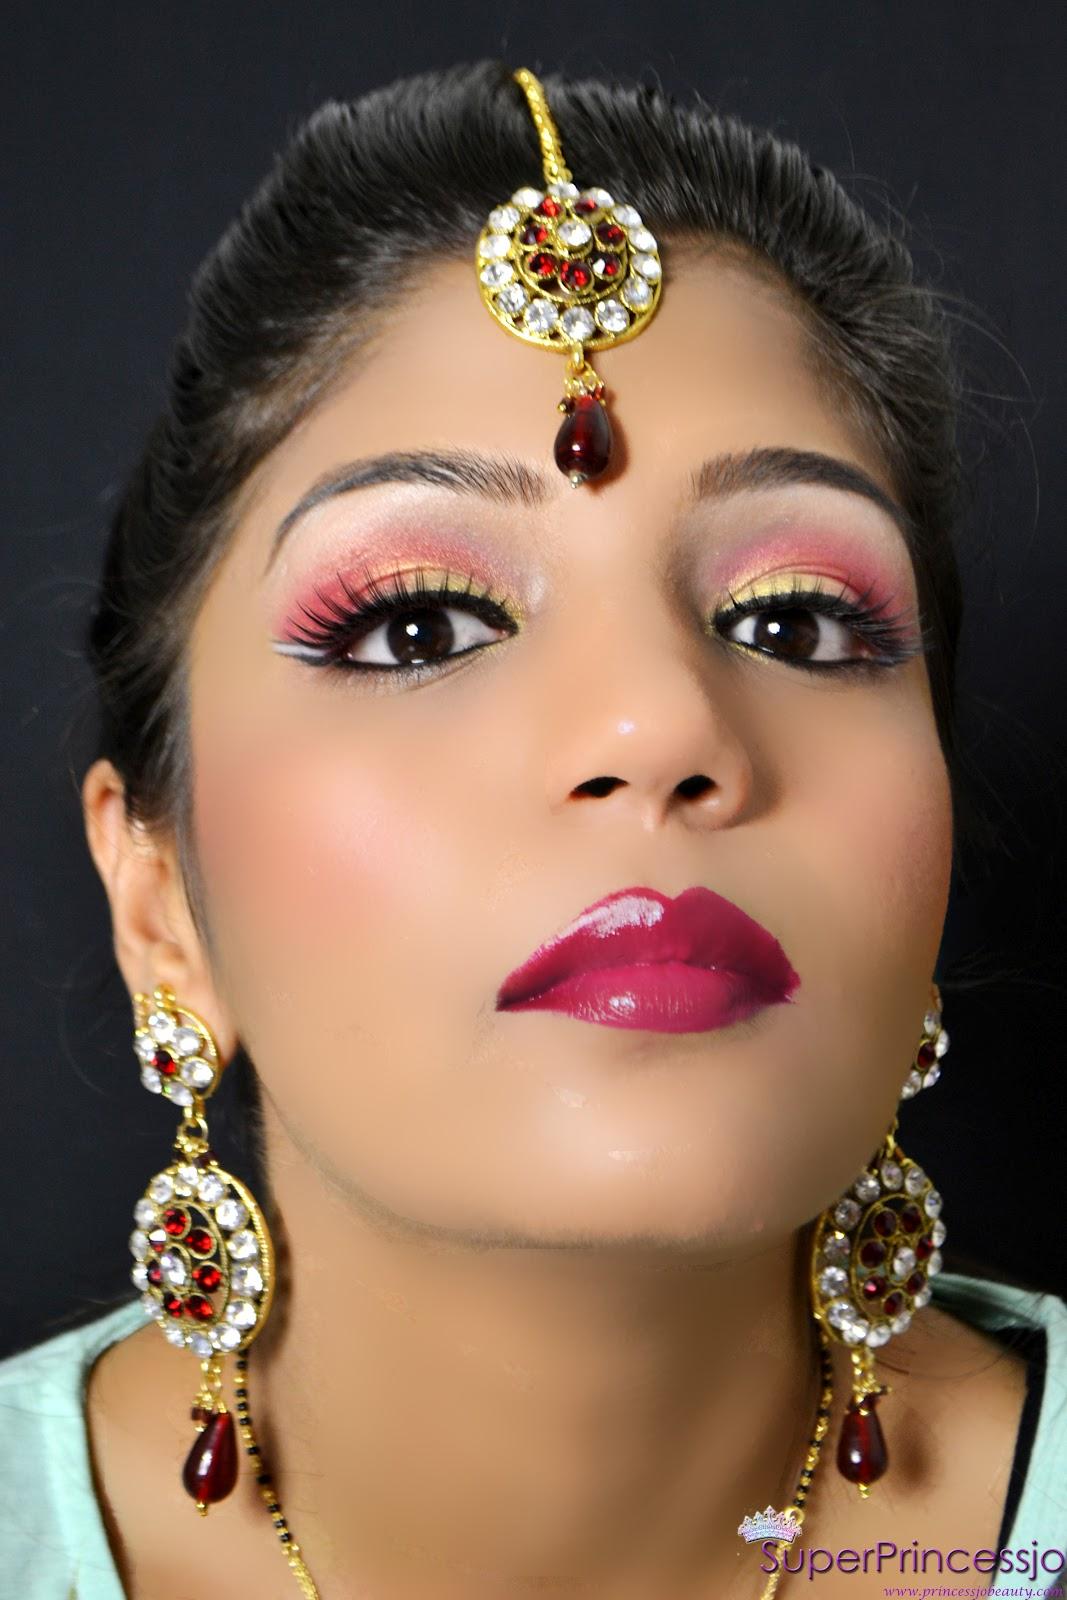 SuperPrincessjo : INDIAN BRIDAL WEDDING MAKEUP -RED GOLD